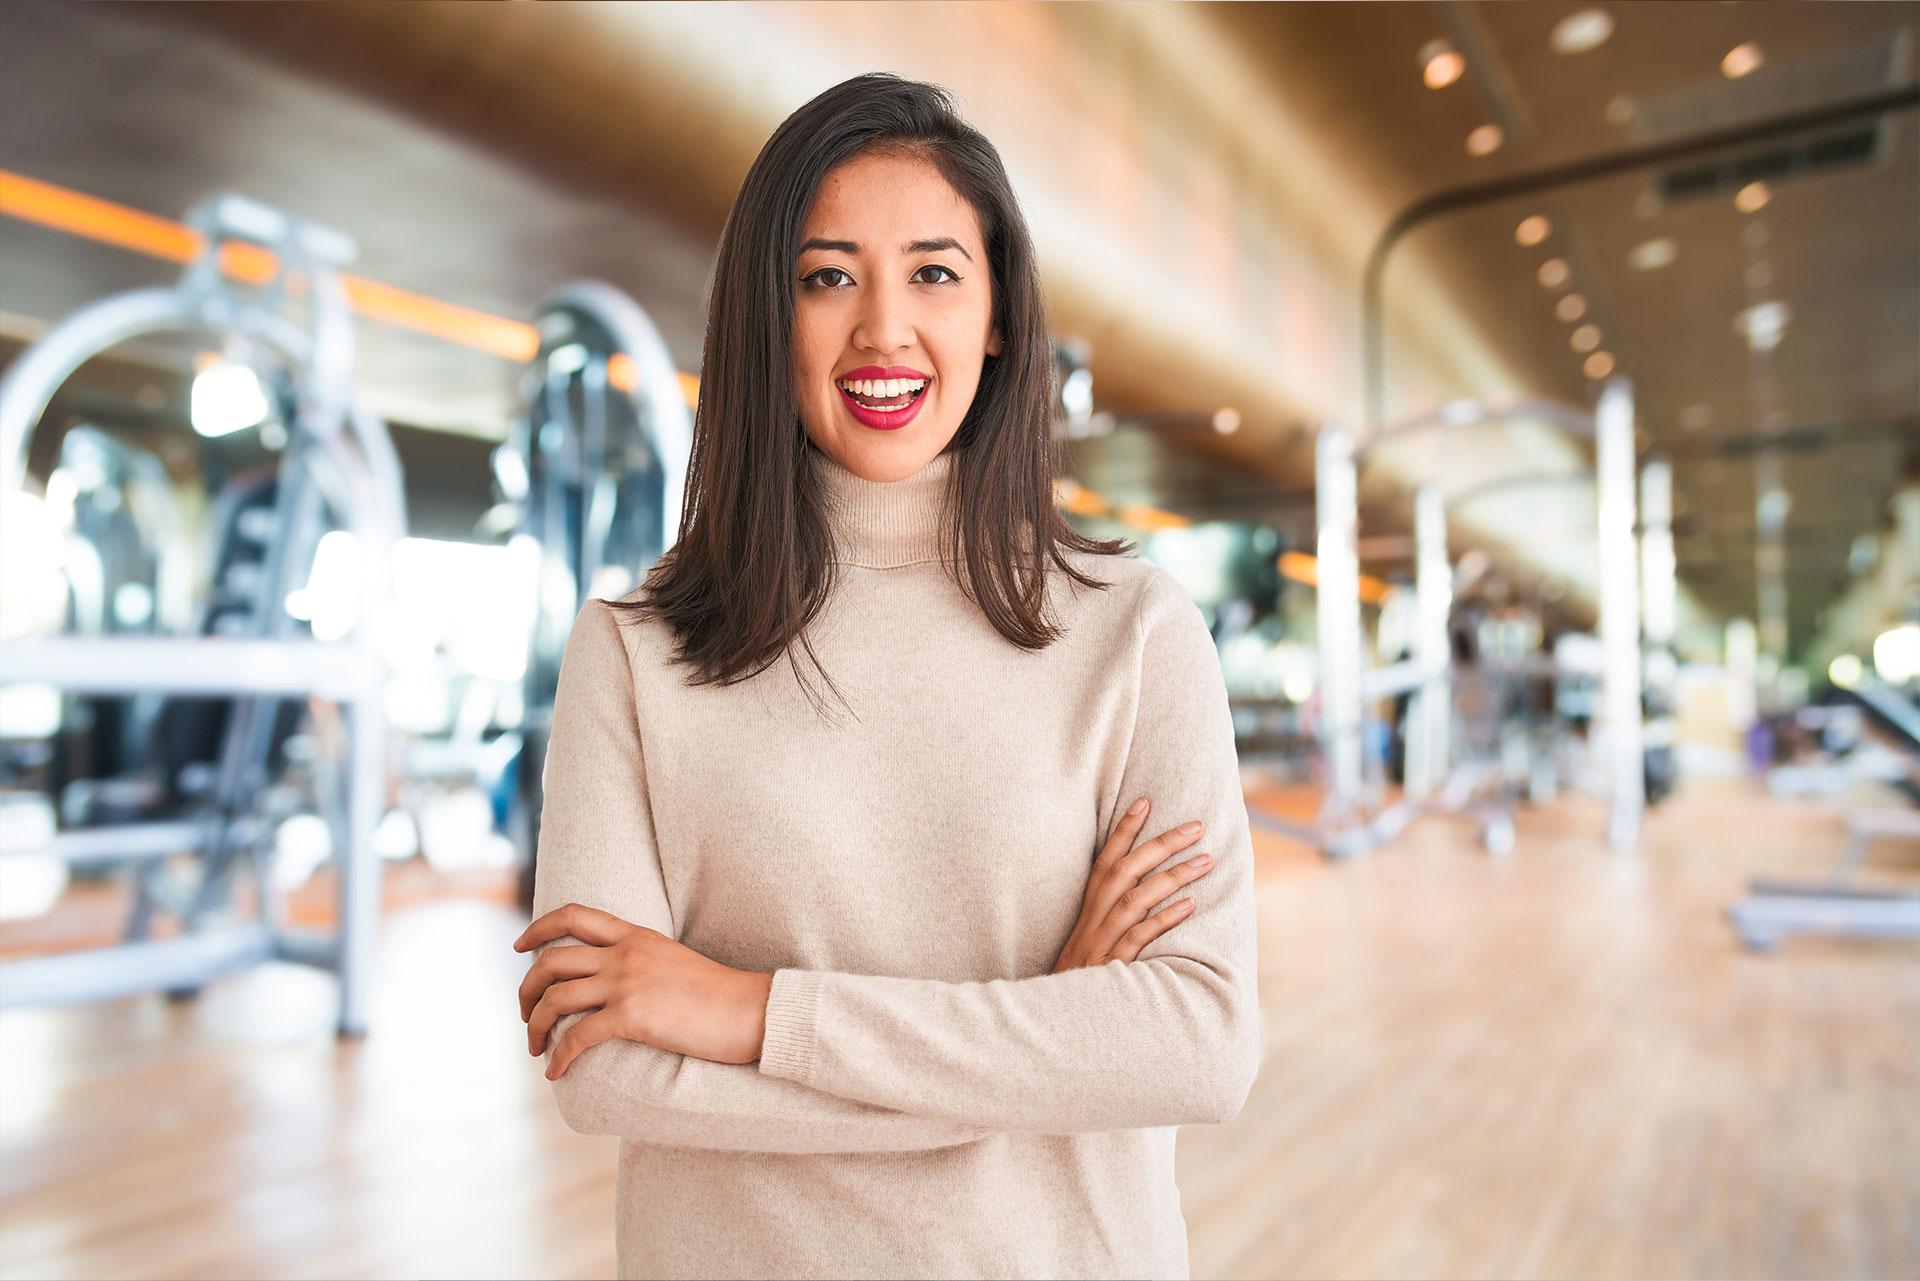 canfitpro 2021 Online: Business & Leadership | carousel background 2